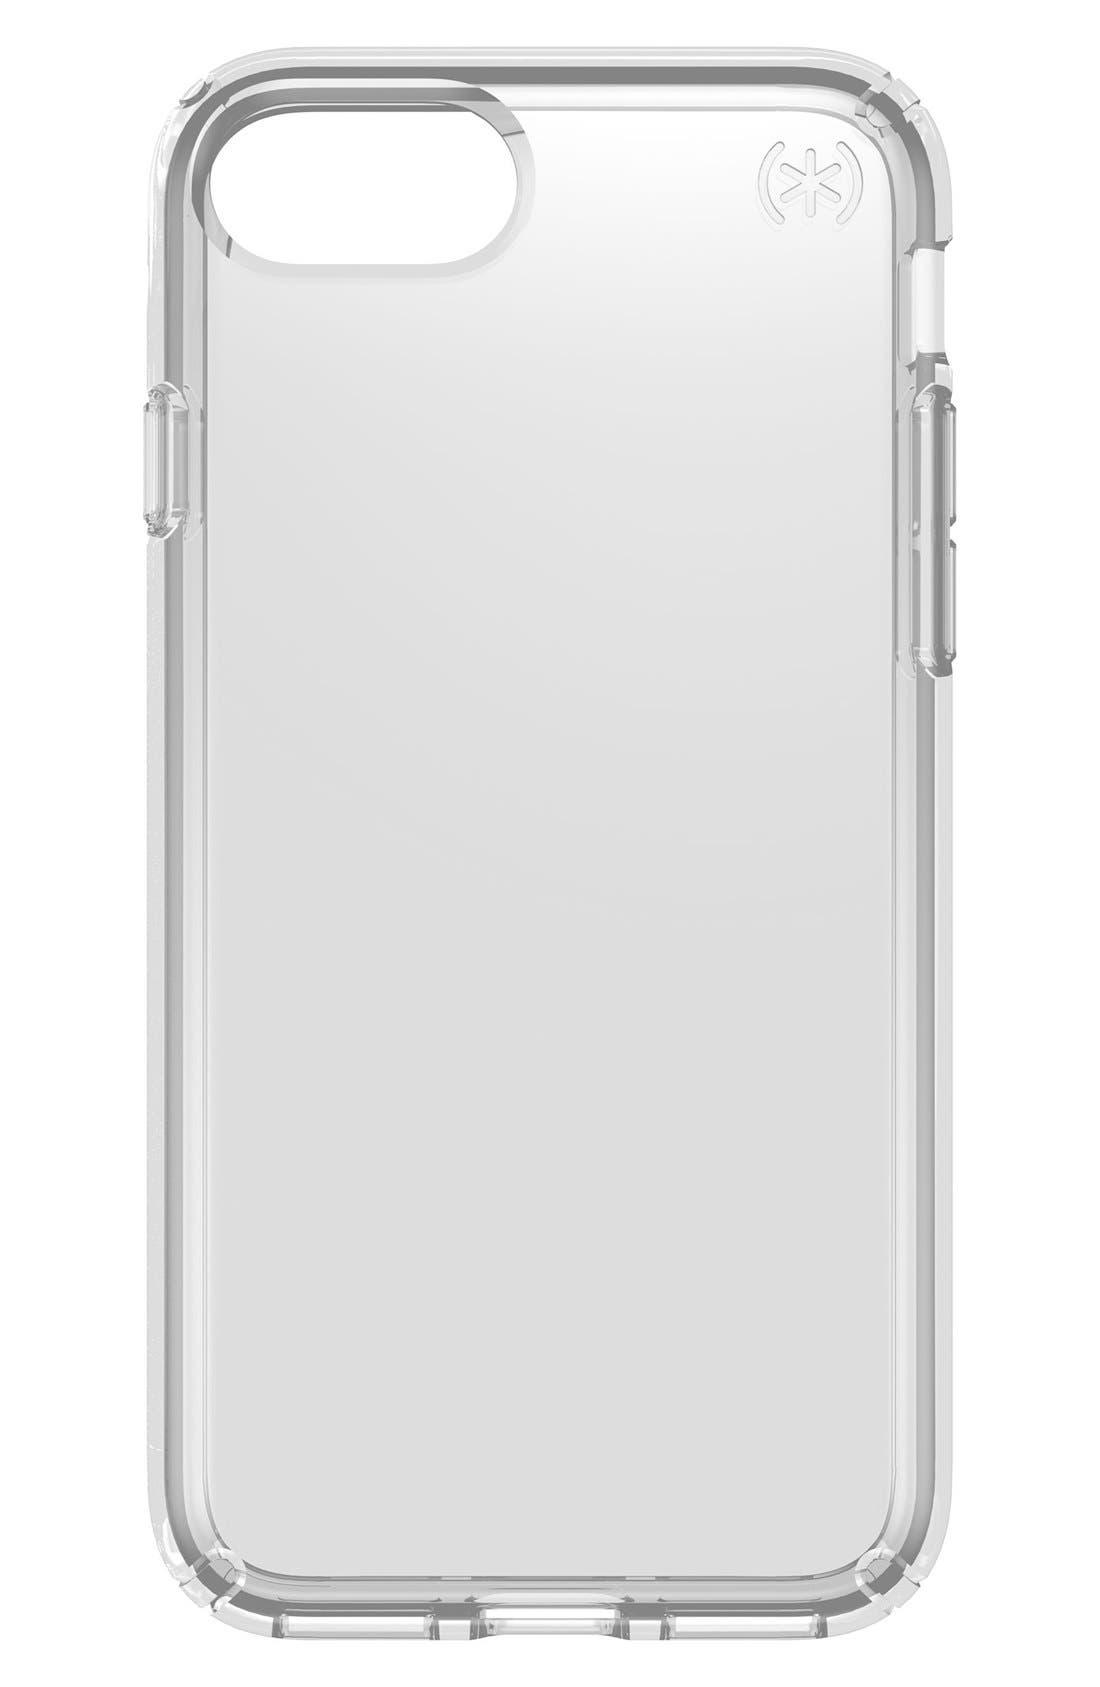 SPECK Presidio CLEAR iPhone 7 & 7 Plus